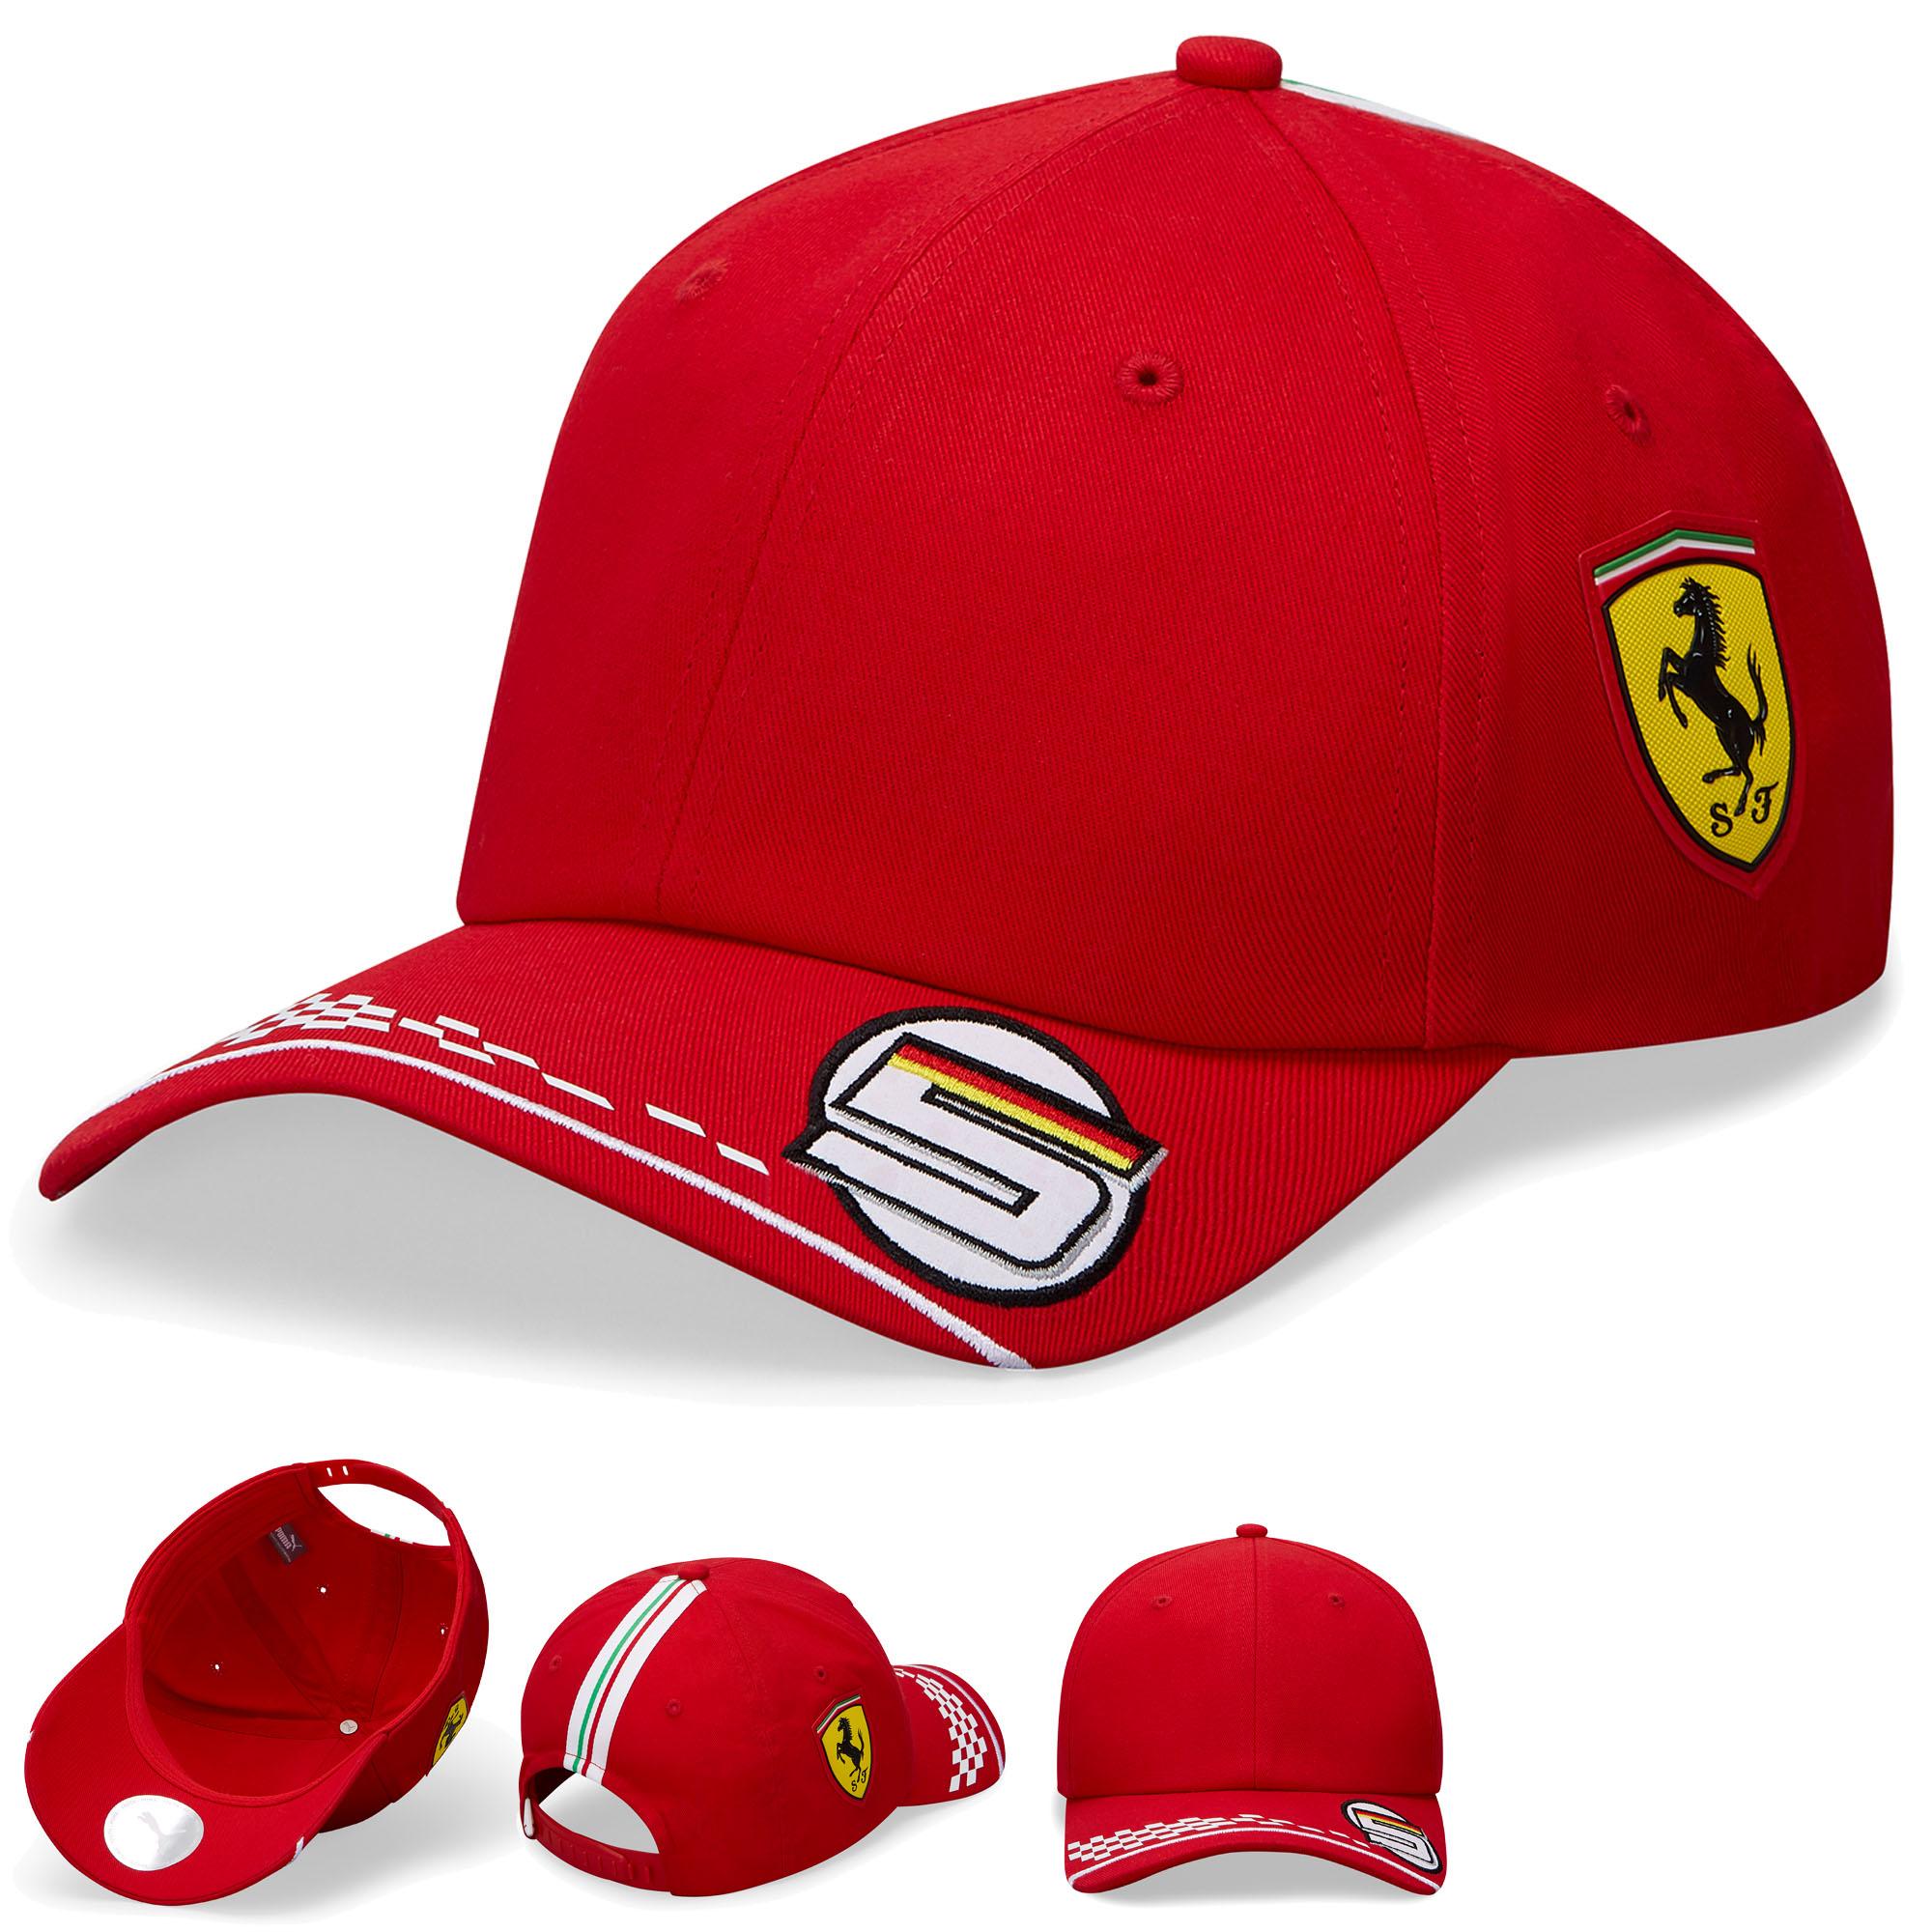 Scuderia Ferrari Replica Sebastian Vettel Hat 2020 Red